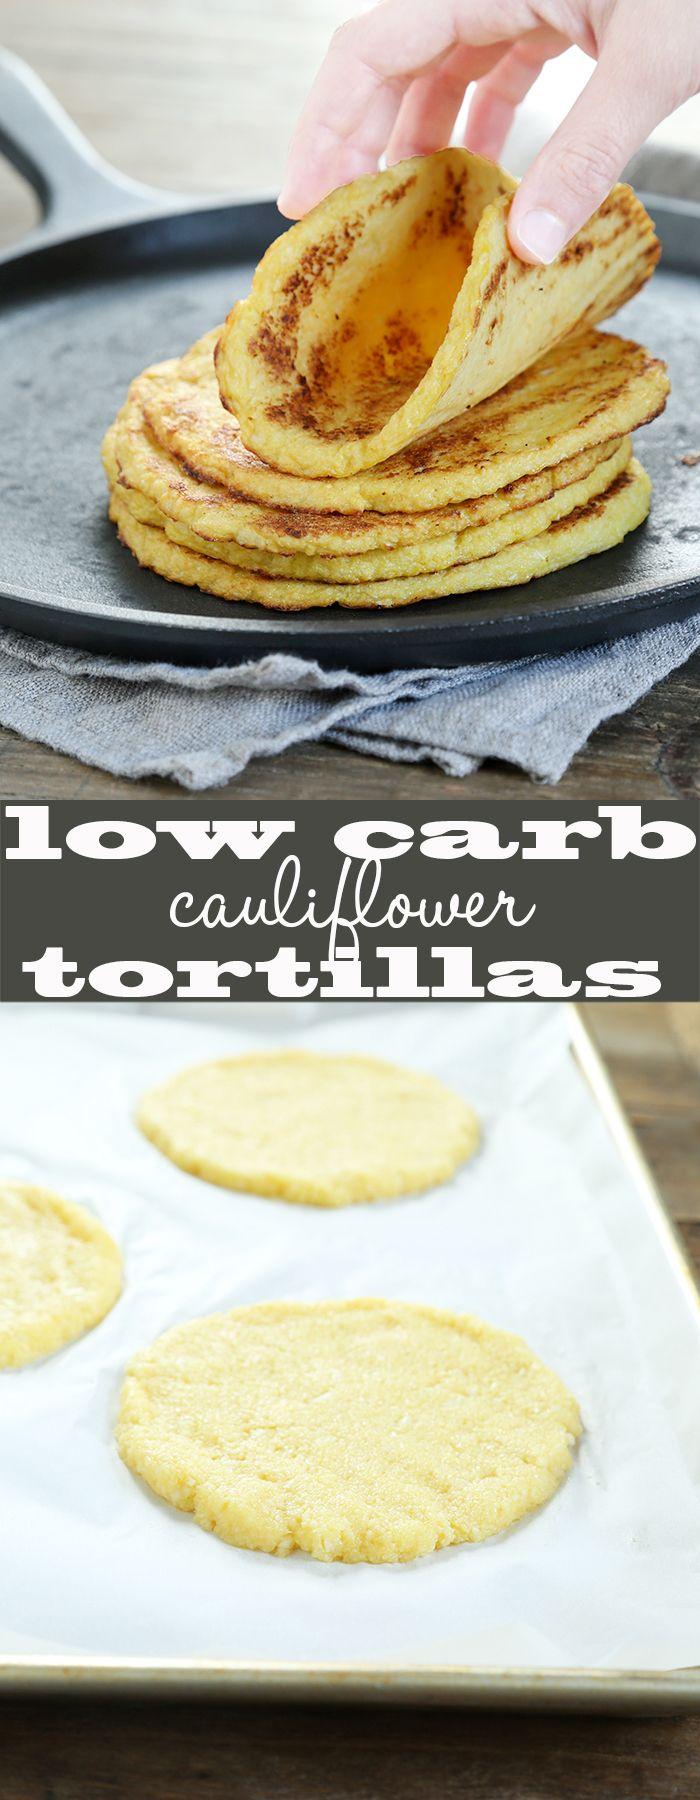 Low Carb Grain Free Cauliflower Tortillas